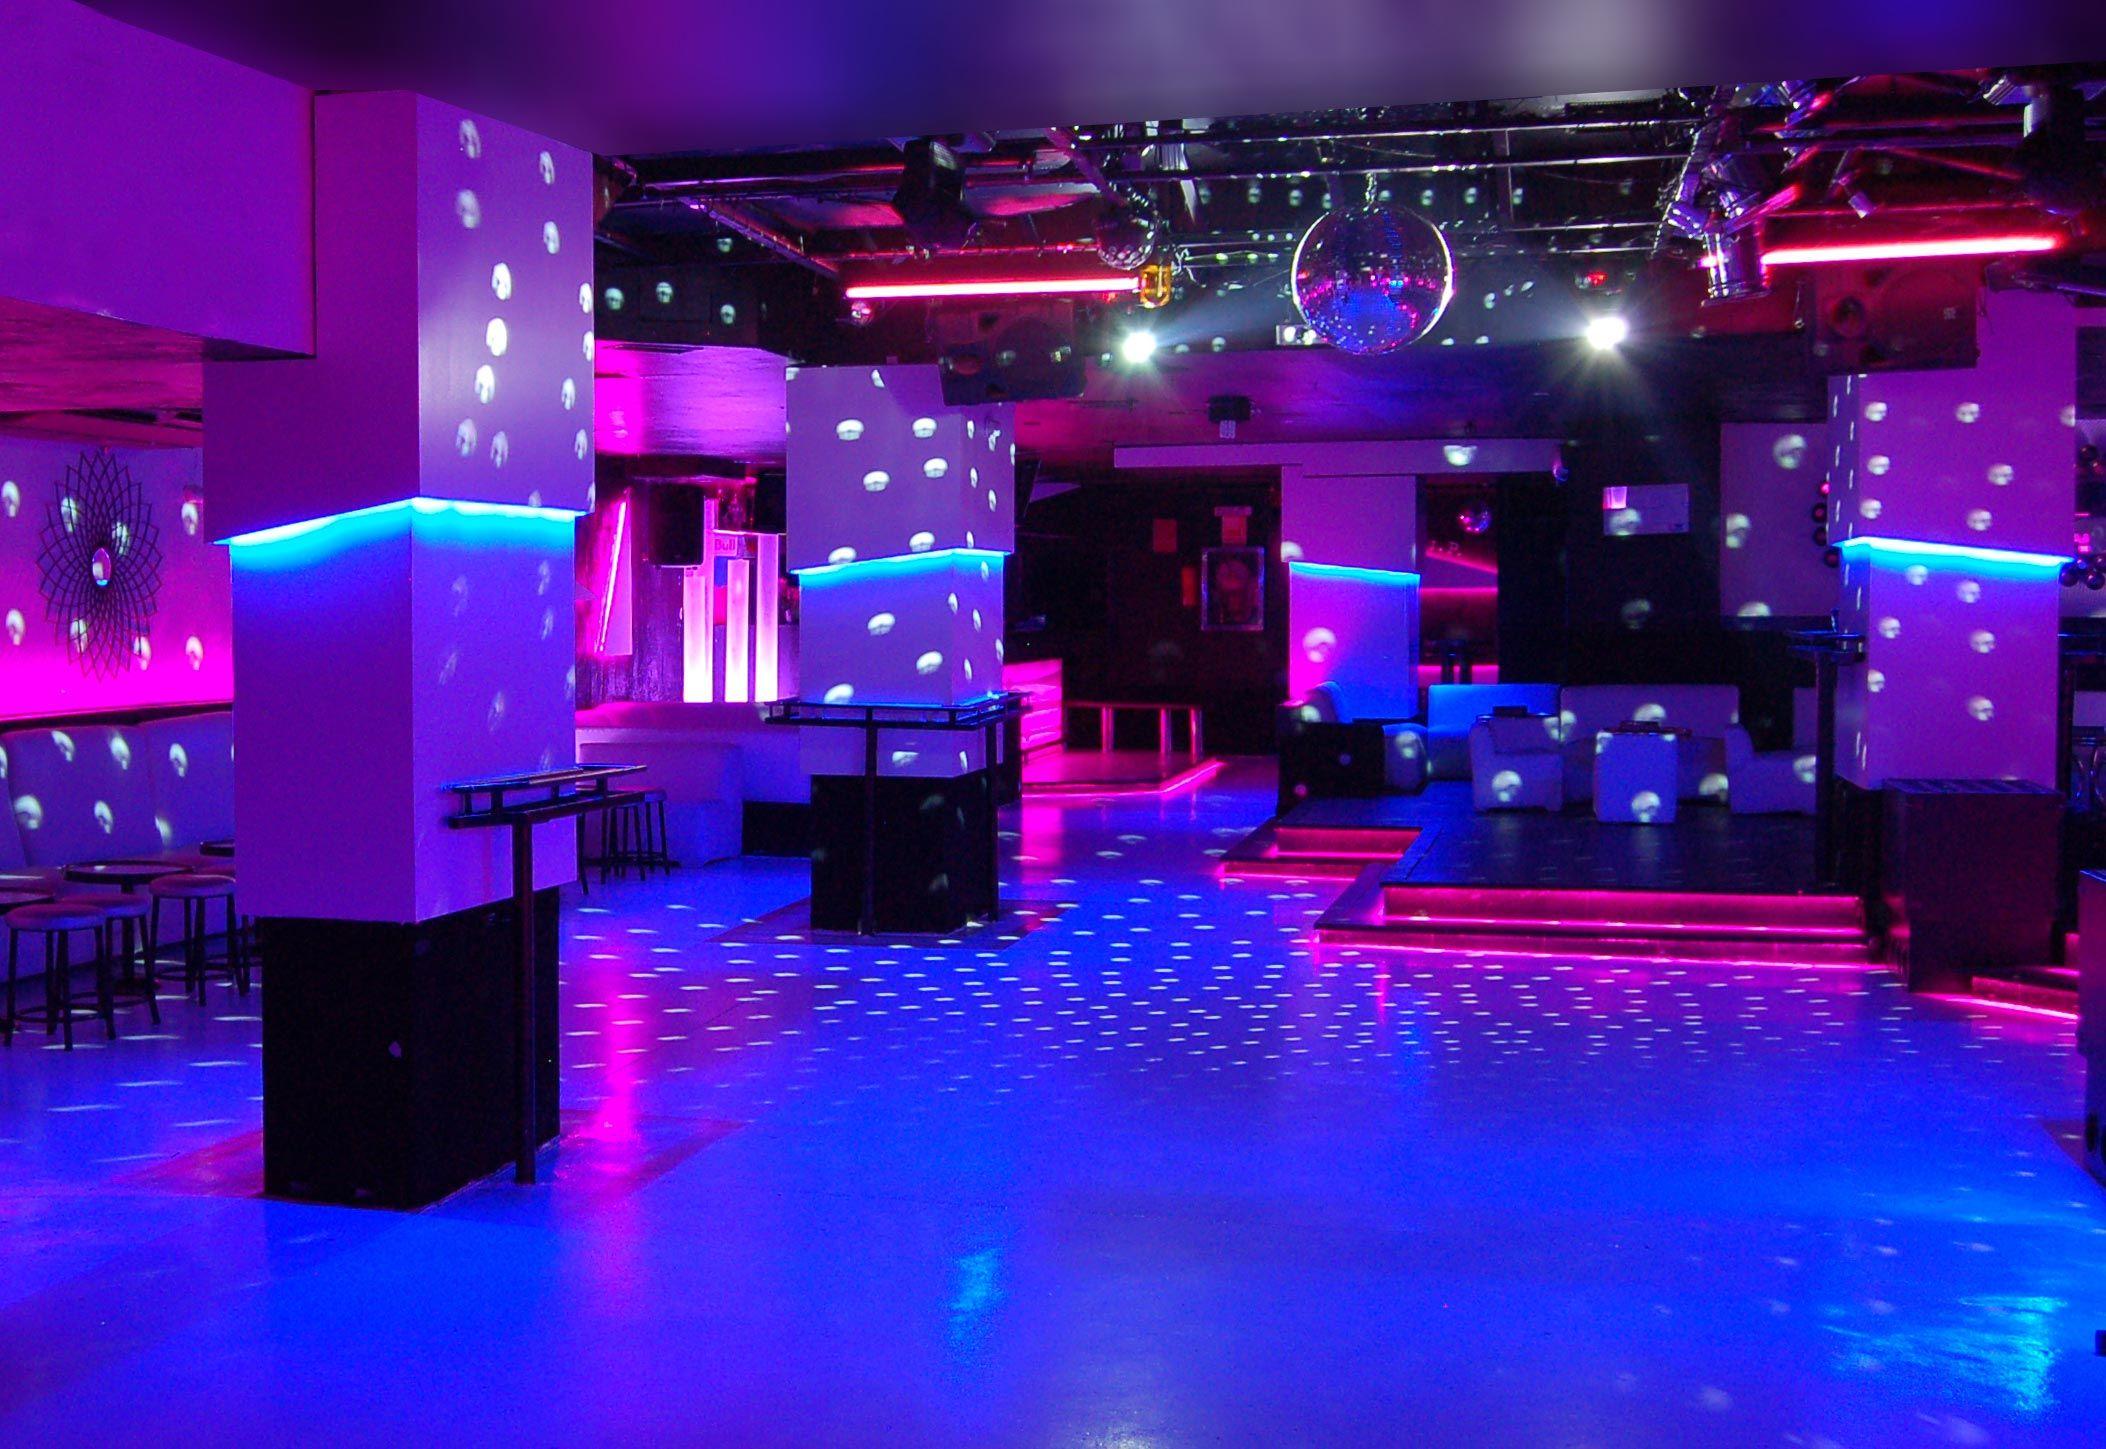 Discoteca ozona vip ocio nocturno madrid pinterest - Ideas para discotecas ...